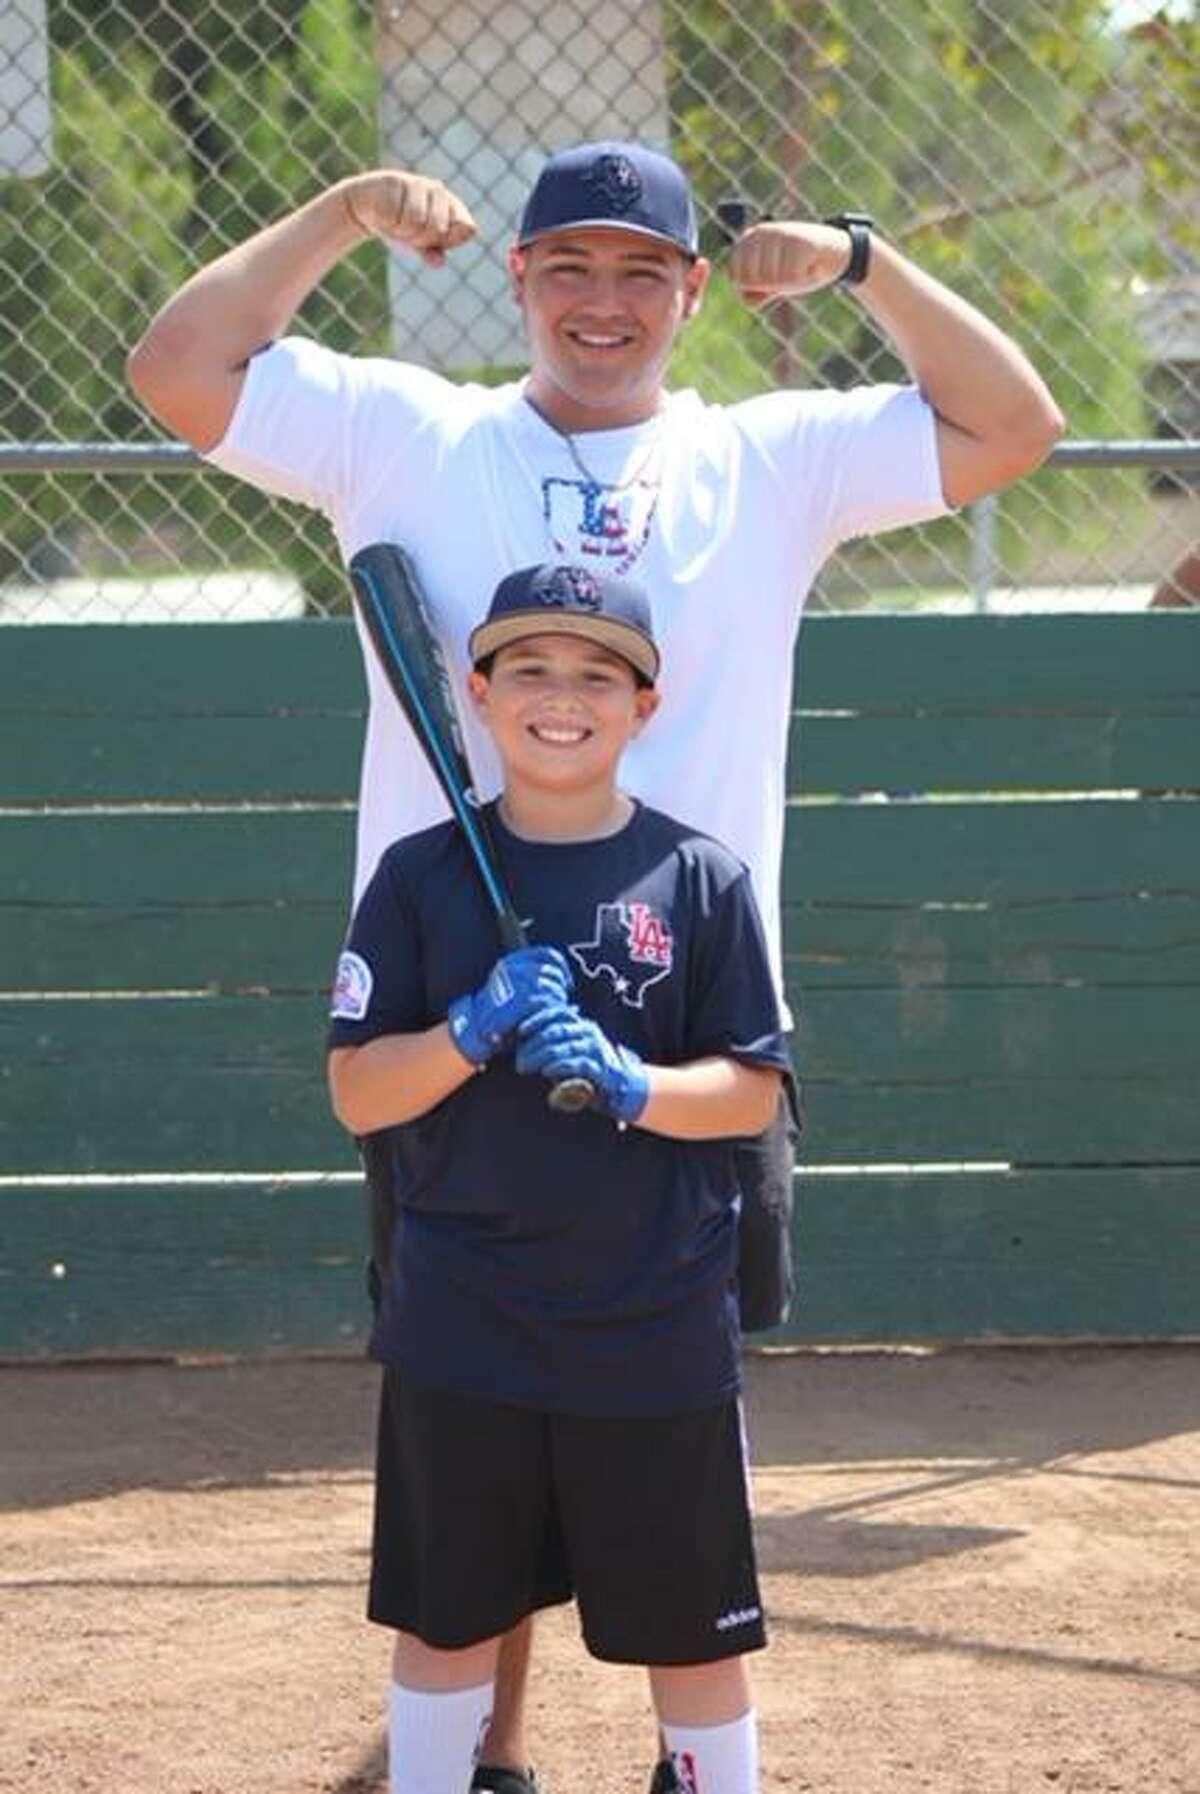 Carlos Nuñez III was crowned the 9U World Series Home Run Derby Champion.